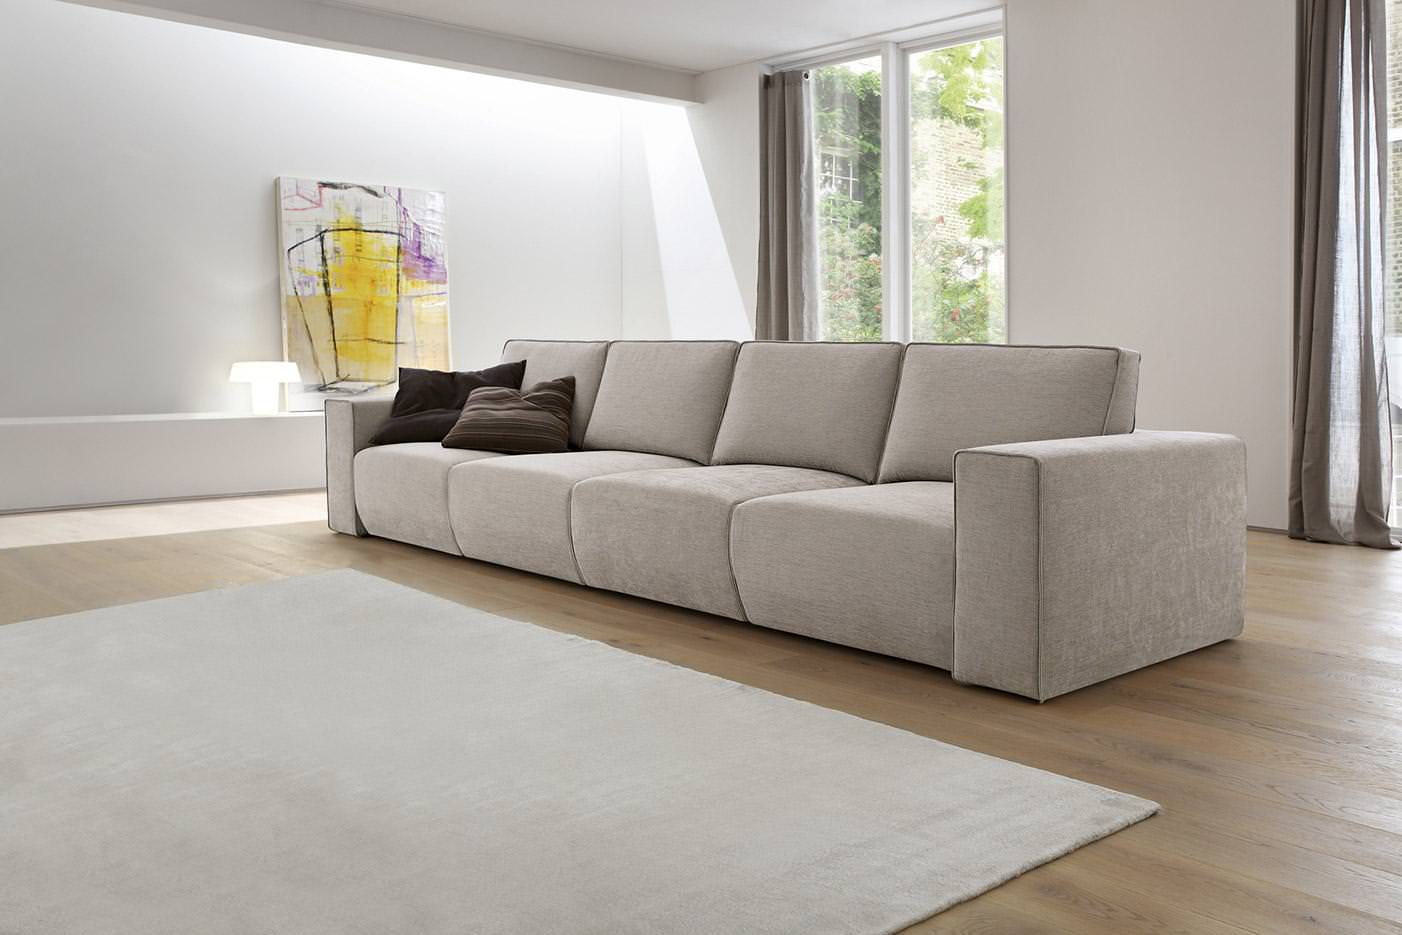 Byron divani moderni e di design felis for Divani moderni di design